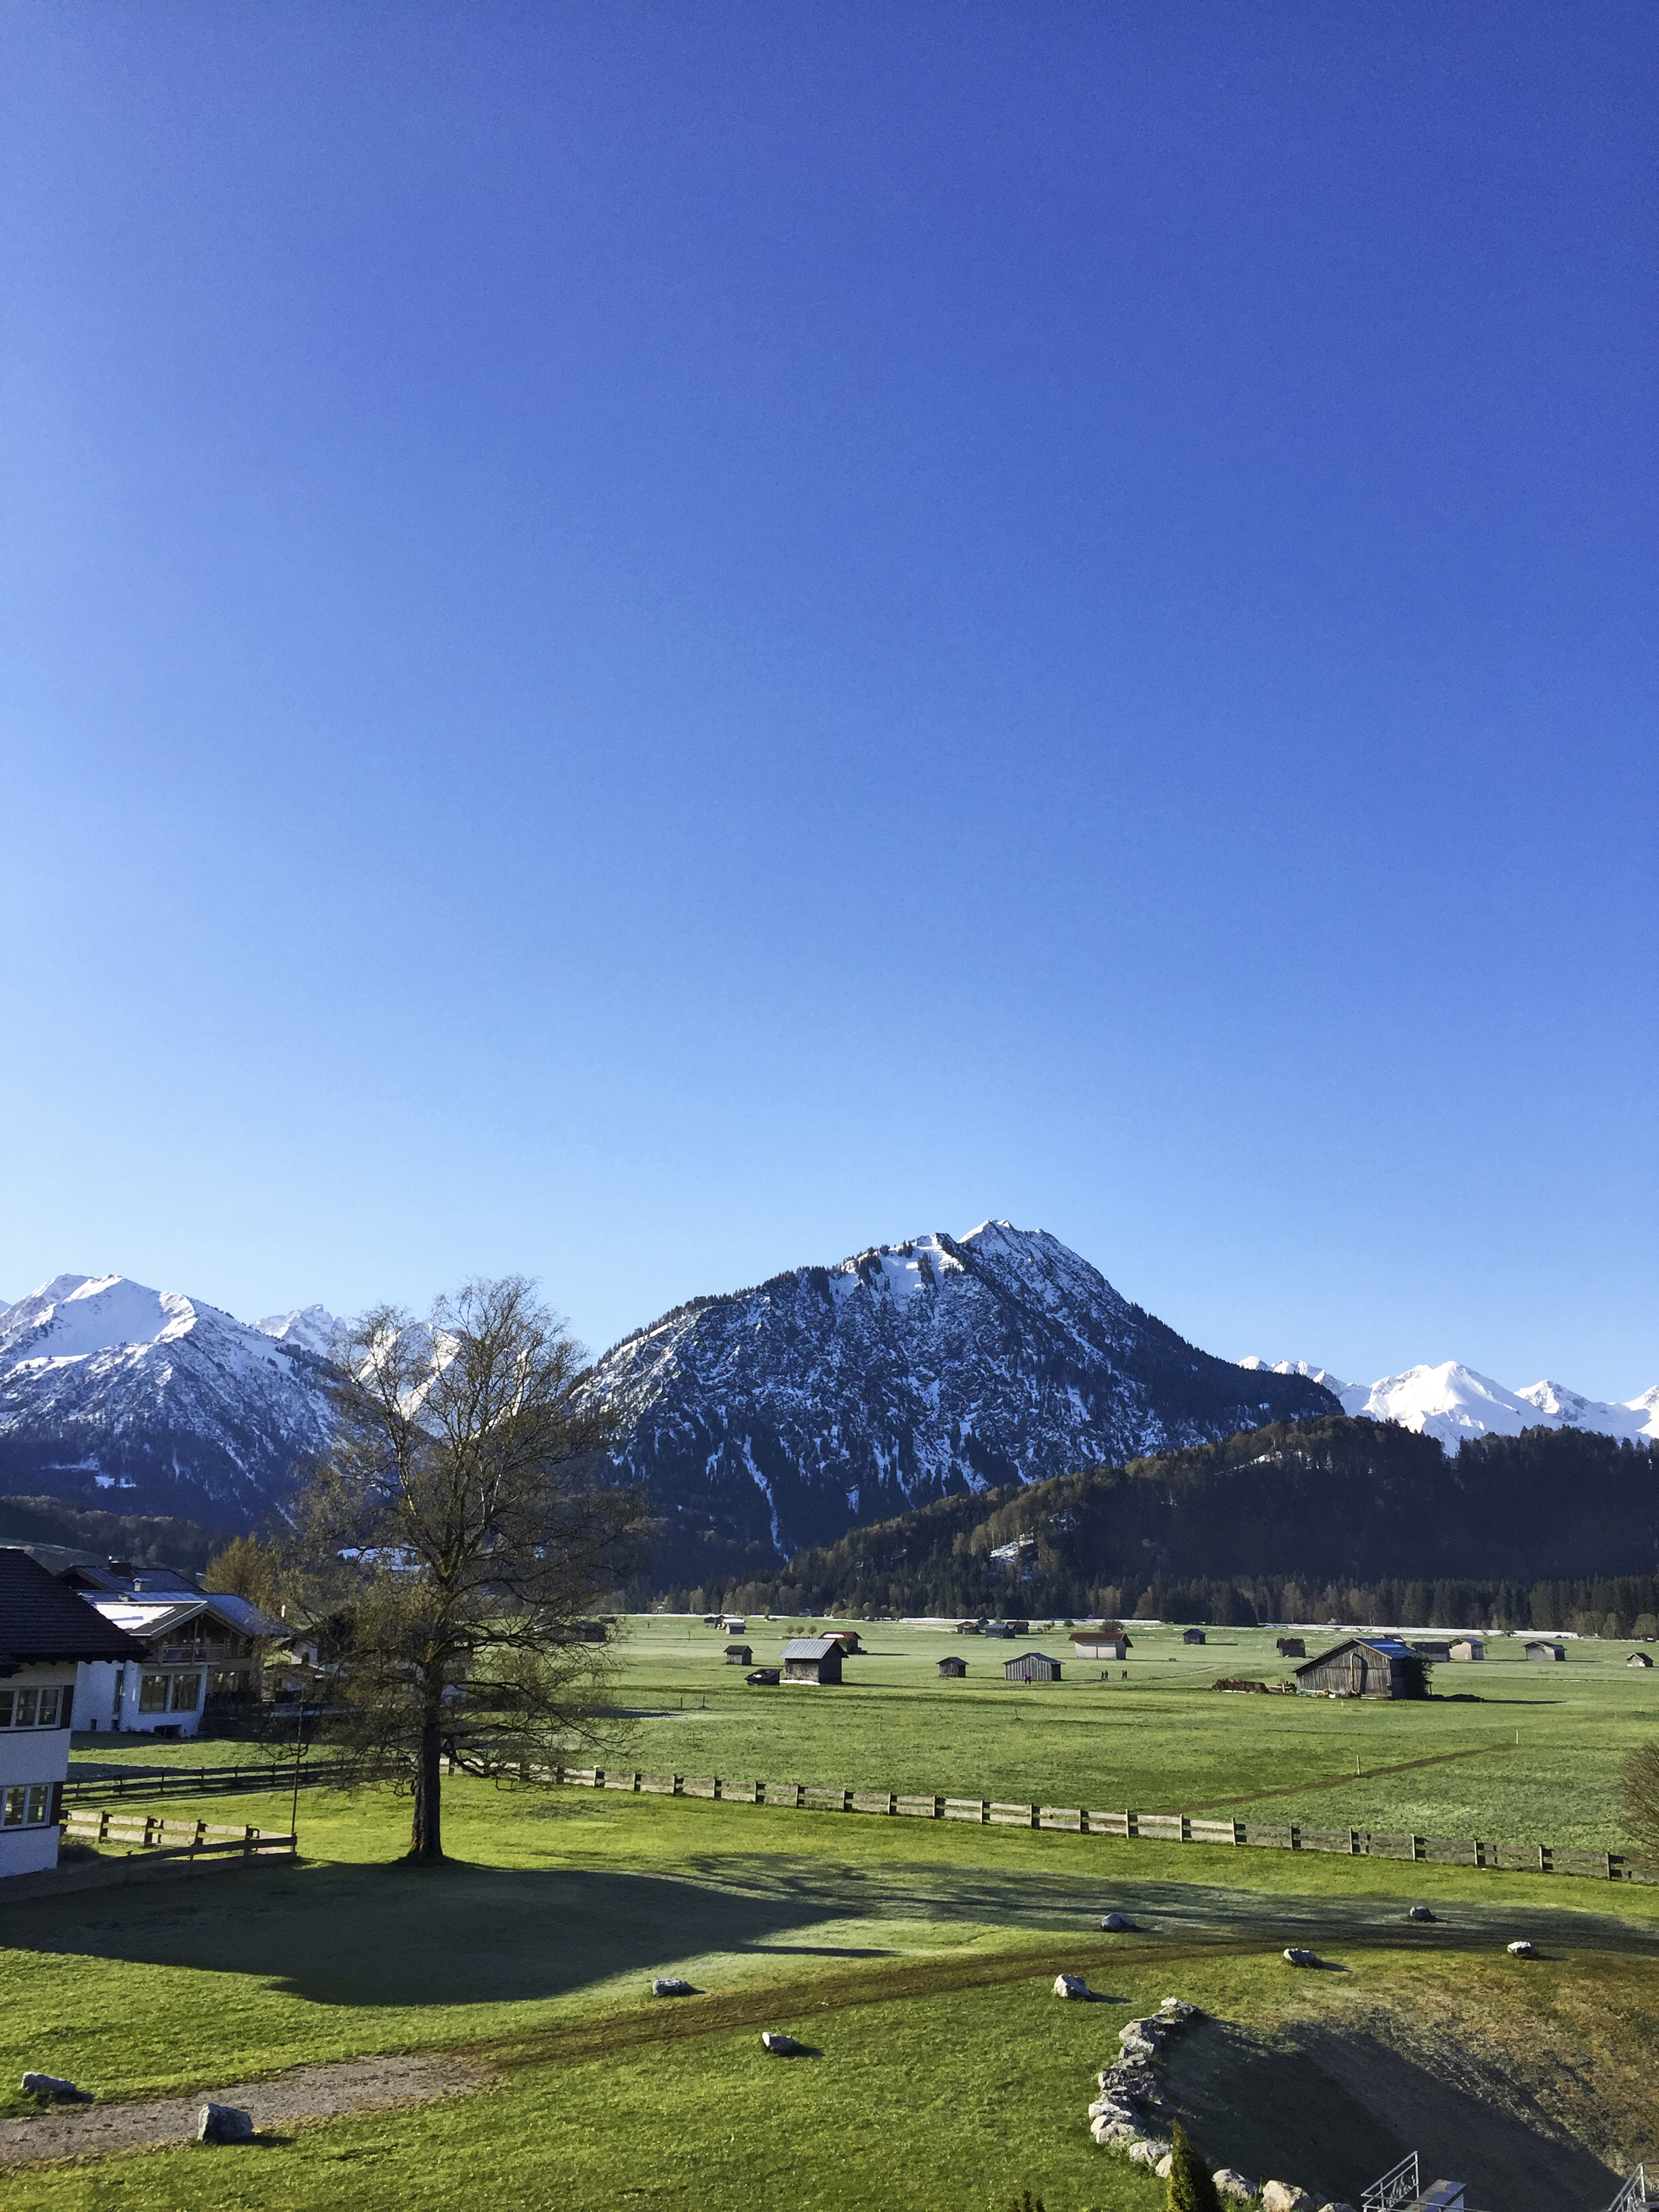 Berge in Bayern bei Oberstdorf